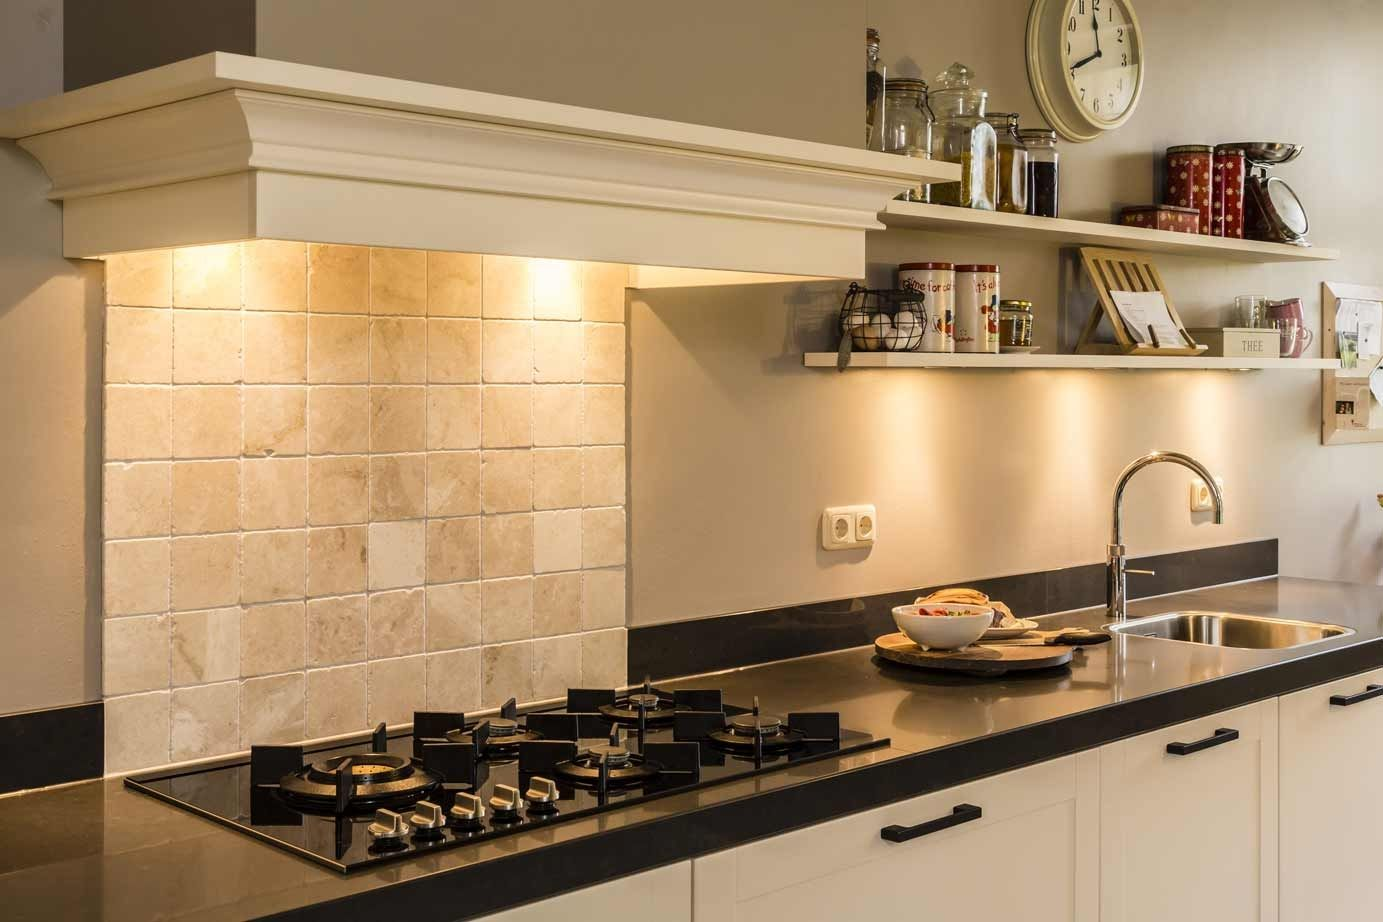 38 Inspirerend Keuken 5000 Euro